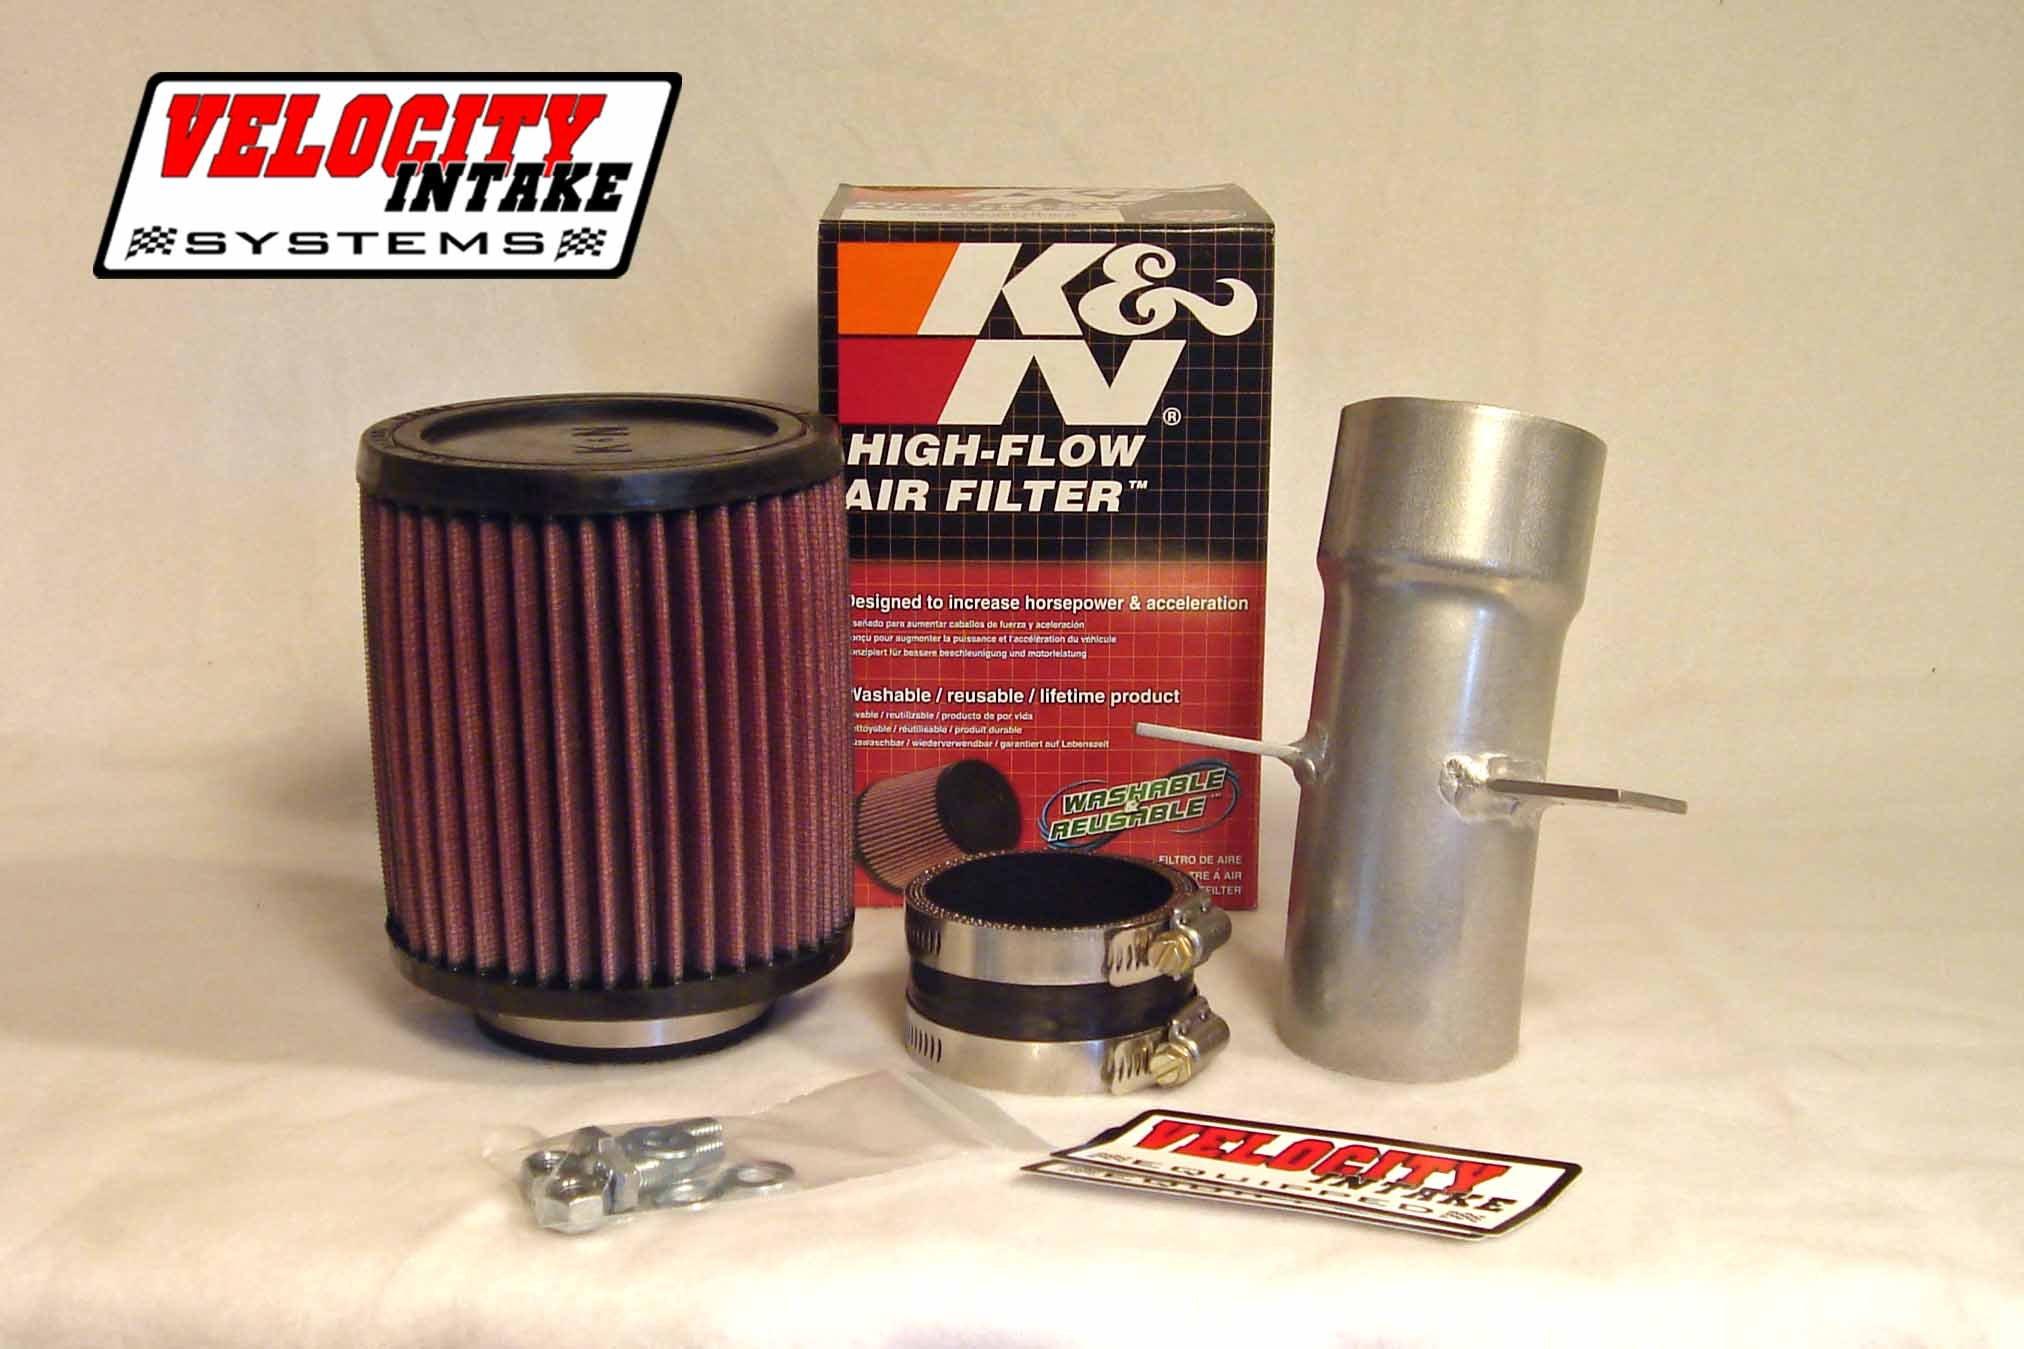 Malone Motorsports VelI-R350-1 Raptor 350 Velocity Intake System with K&N Filter by Velocity Intake Systems